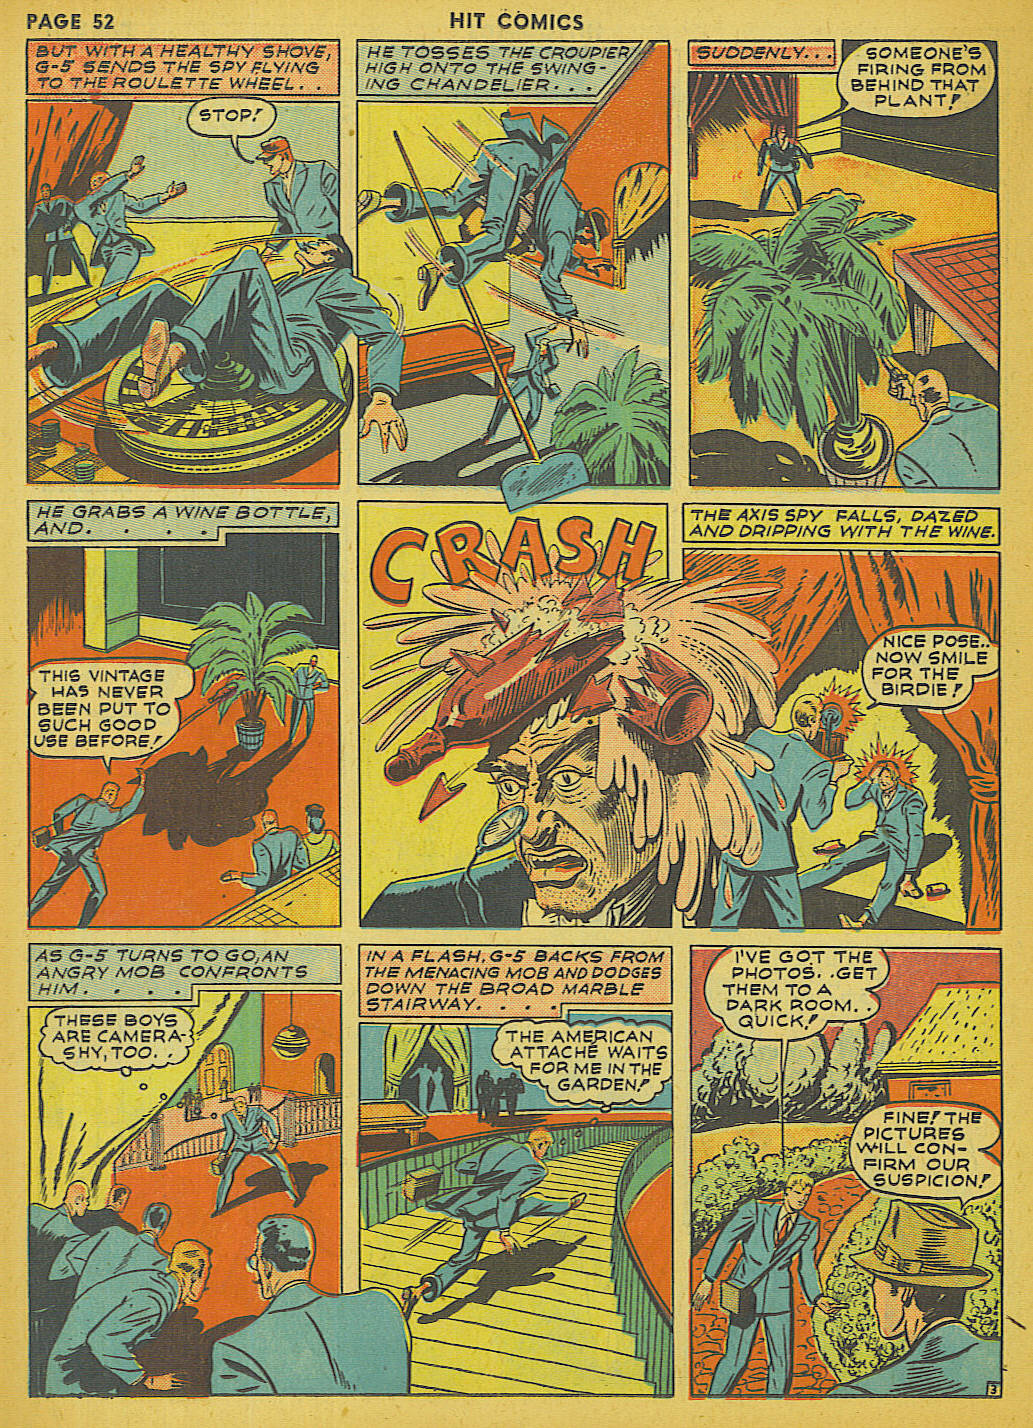 Read online Hit Comics comic -  Issue #13 - 54